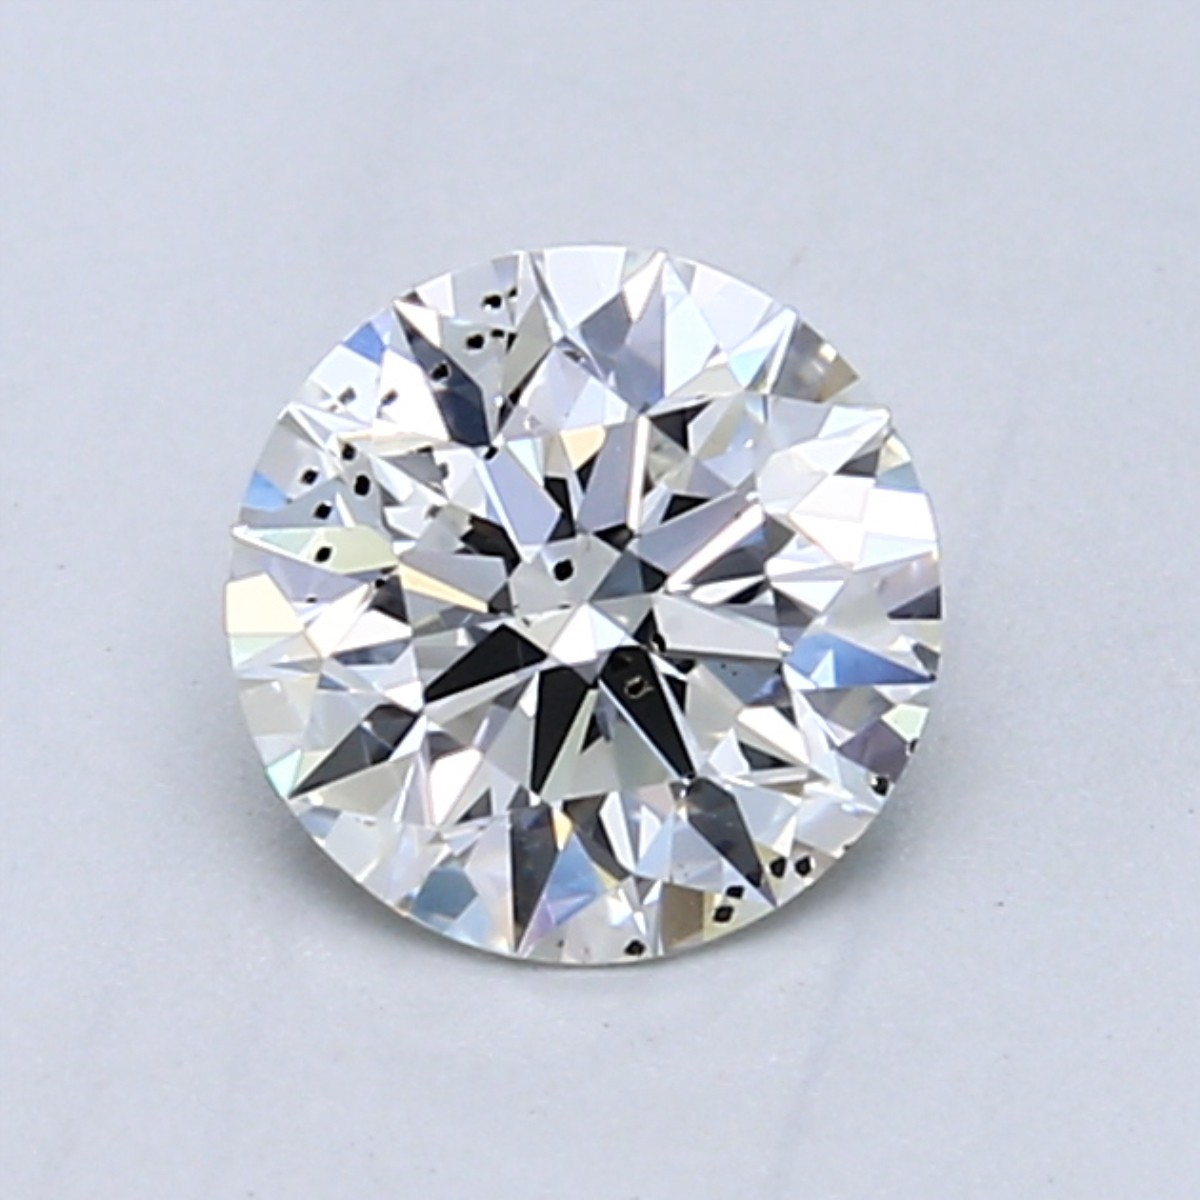 Dark inclusions in an SI2 diamond